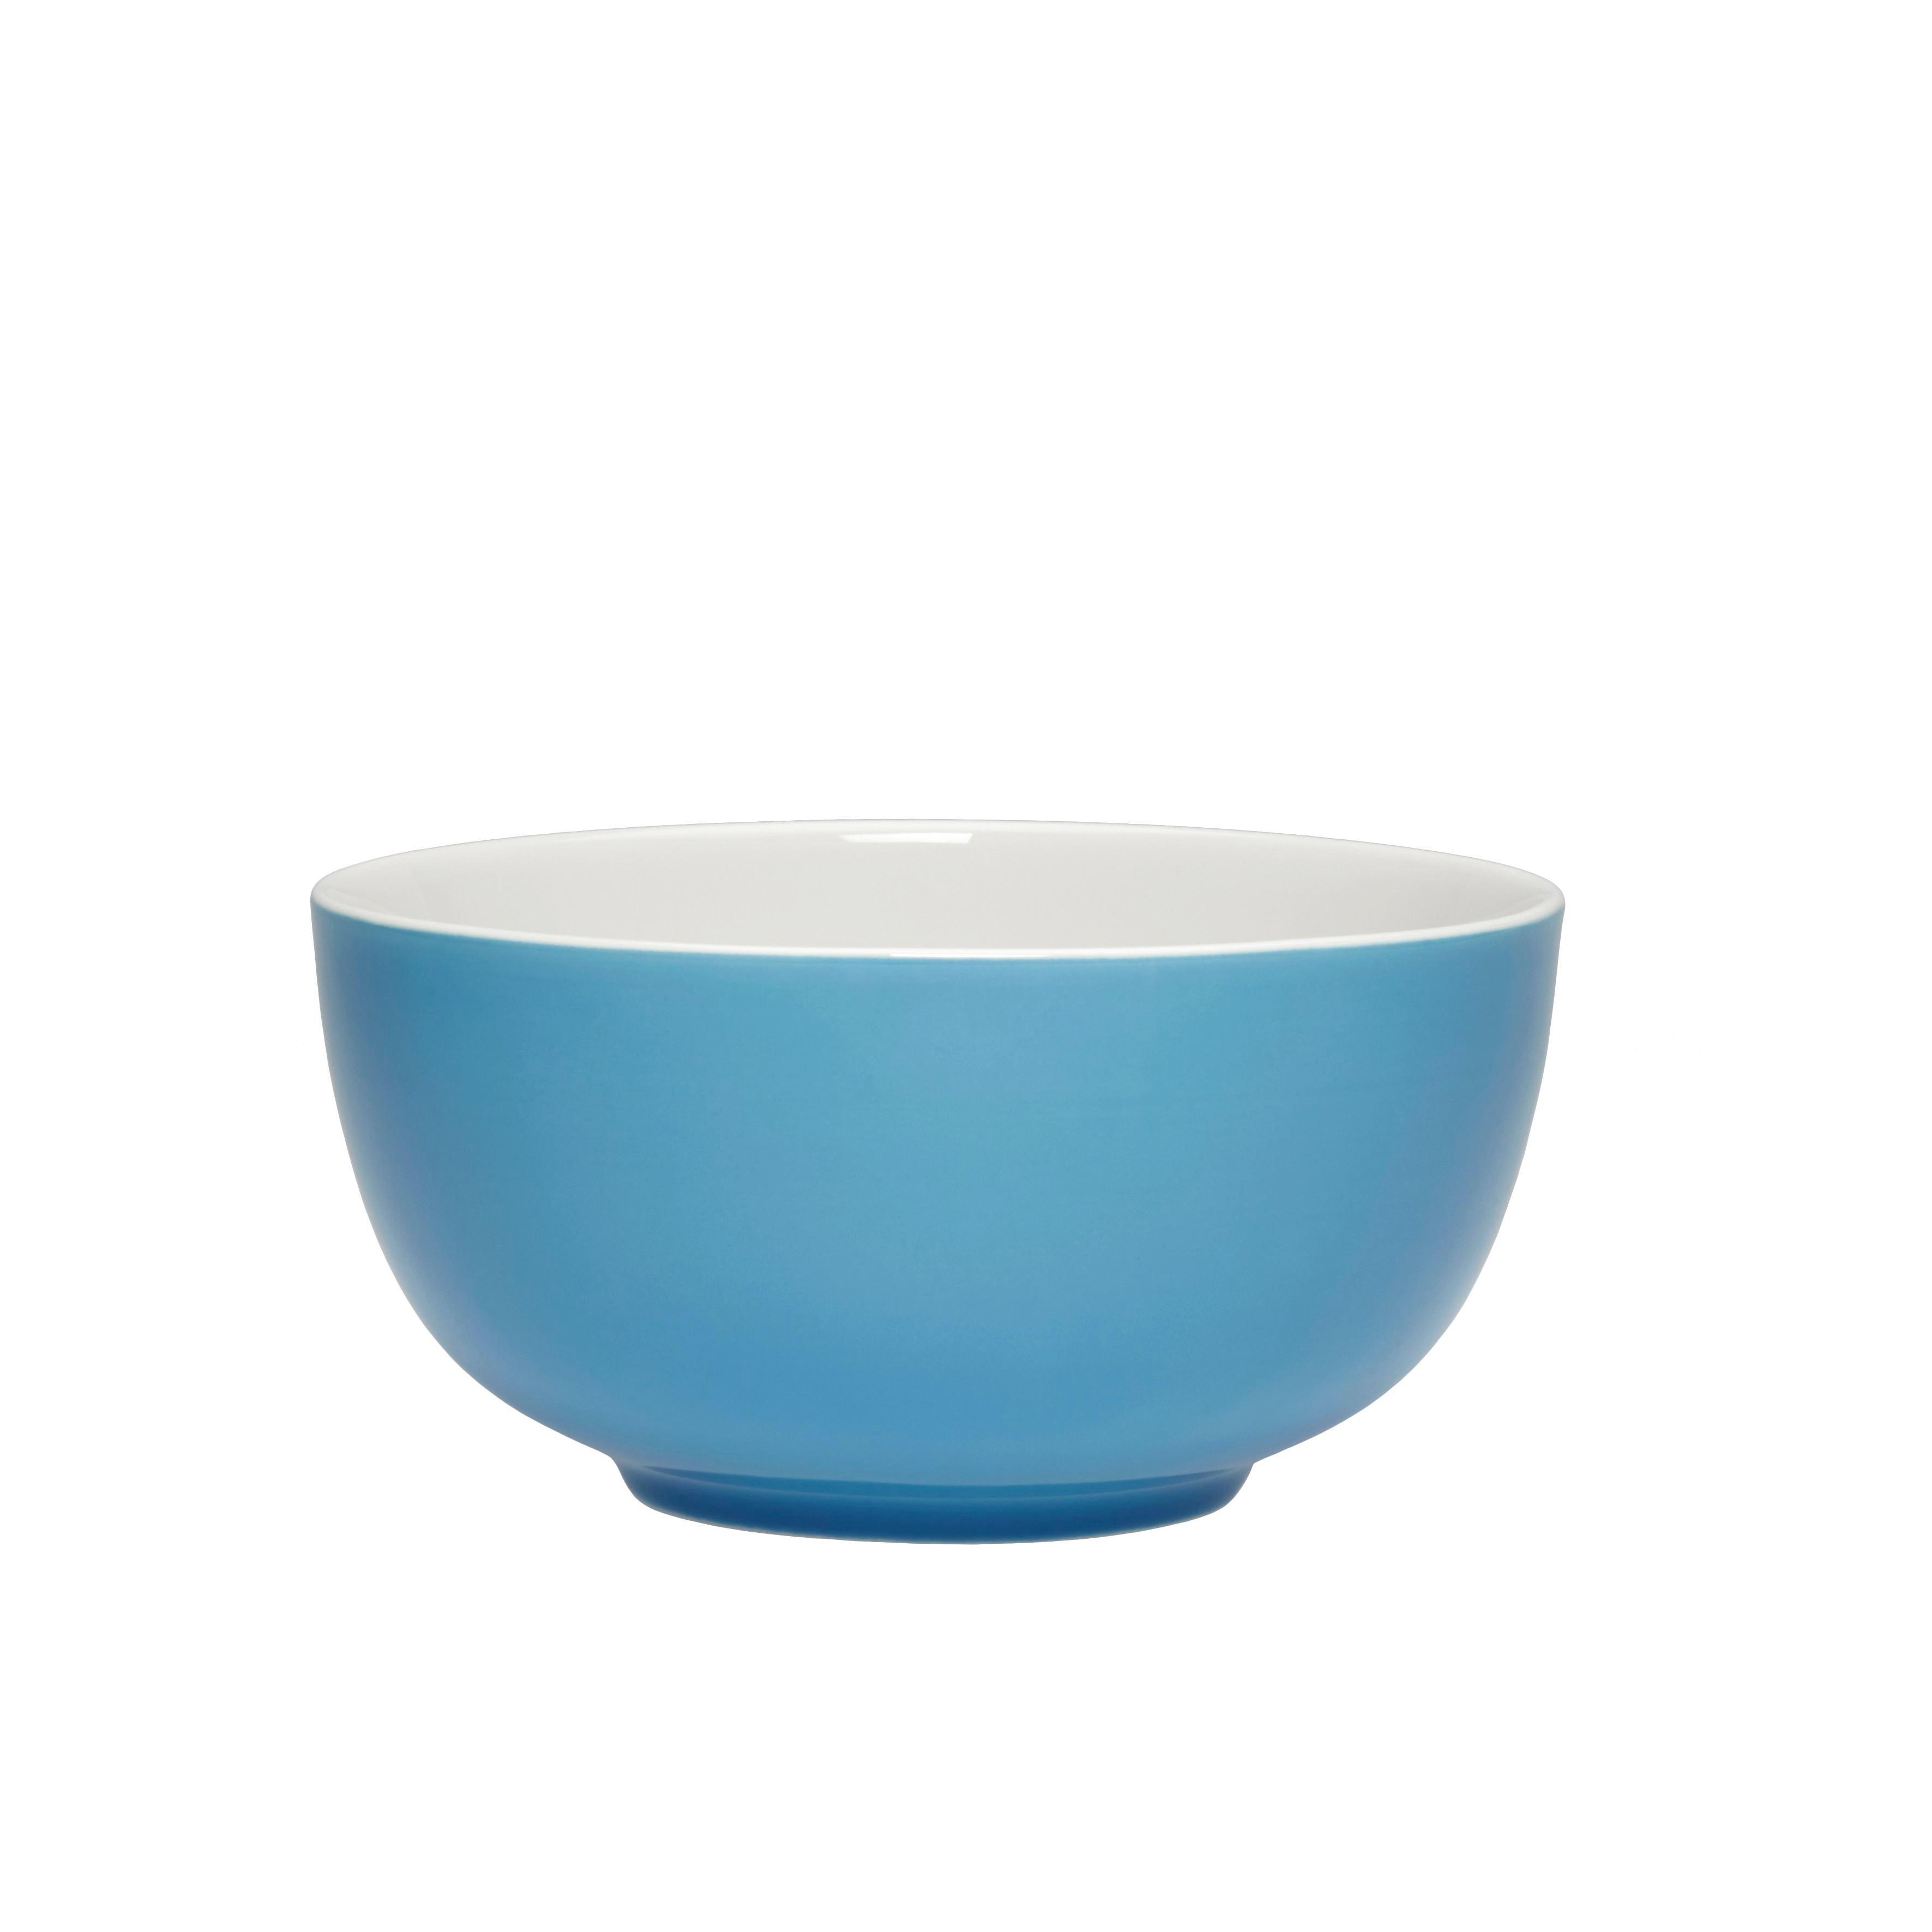 Müslischale Sandy in Türkis aus Keramik - Türkis, KONVENTIONELL, Keramik (13,7/6,6cm) - MÖMAX modern living